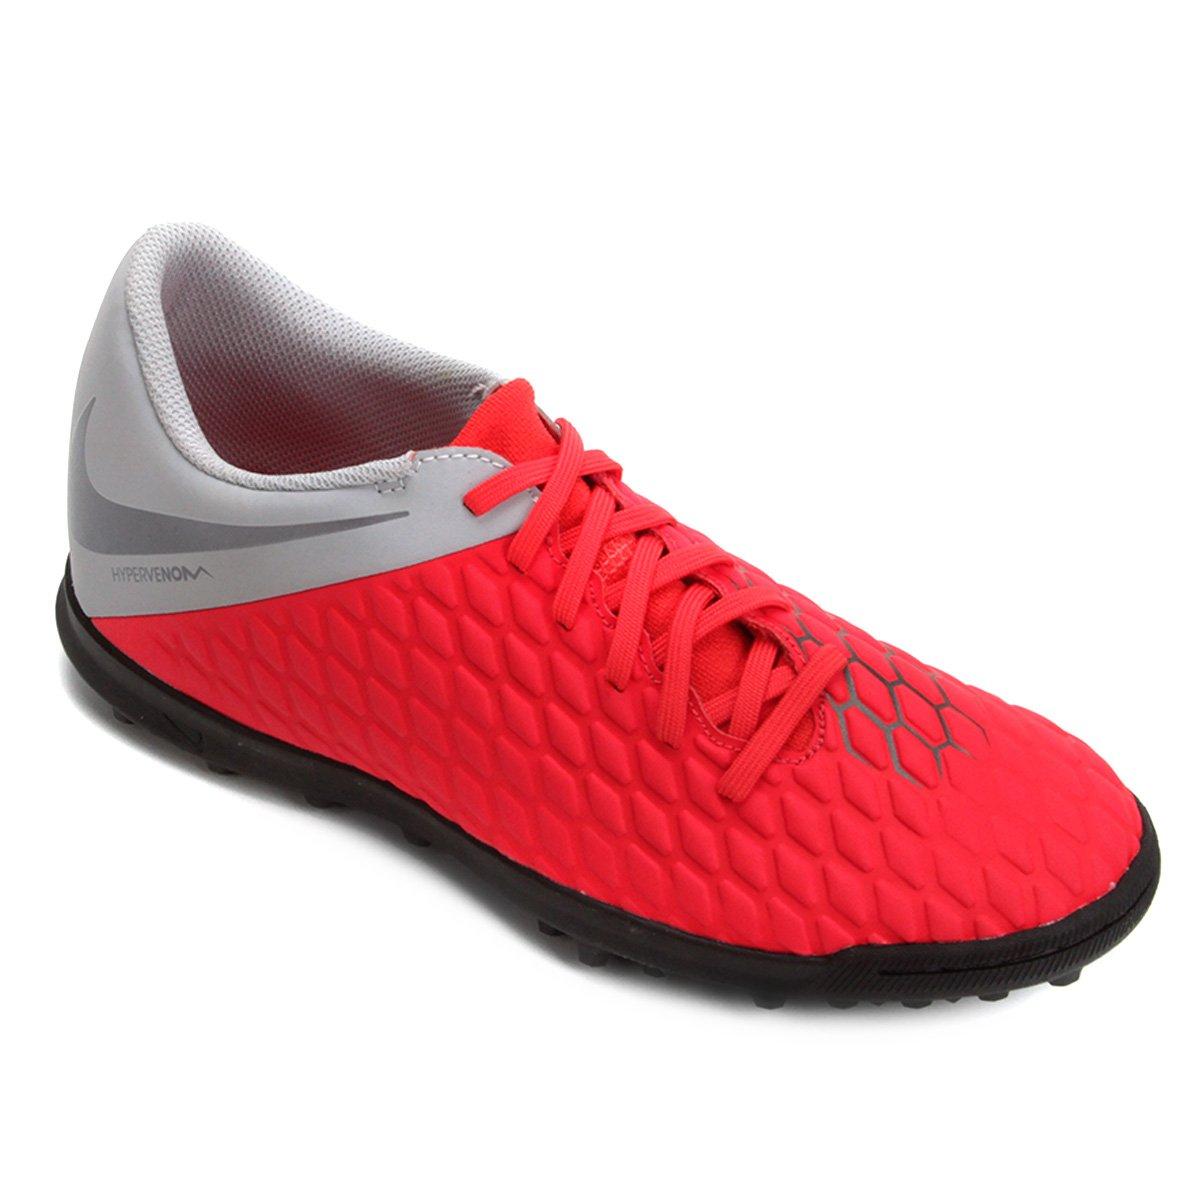 16ec14b25a39d Chuteira Society Nike Hypervenom Phantom 3 Club TF - Vermelho e Cinza -  Compre Agora